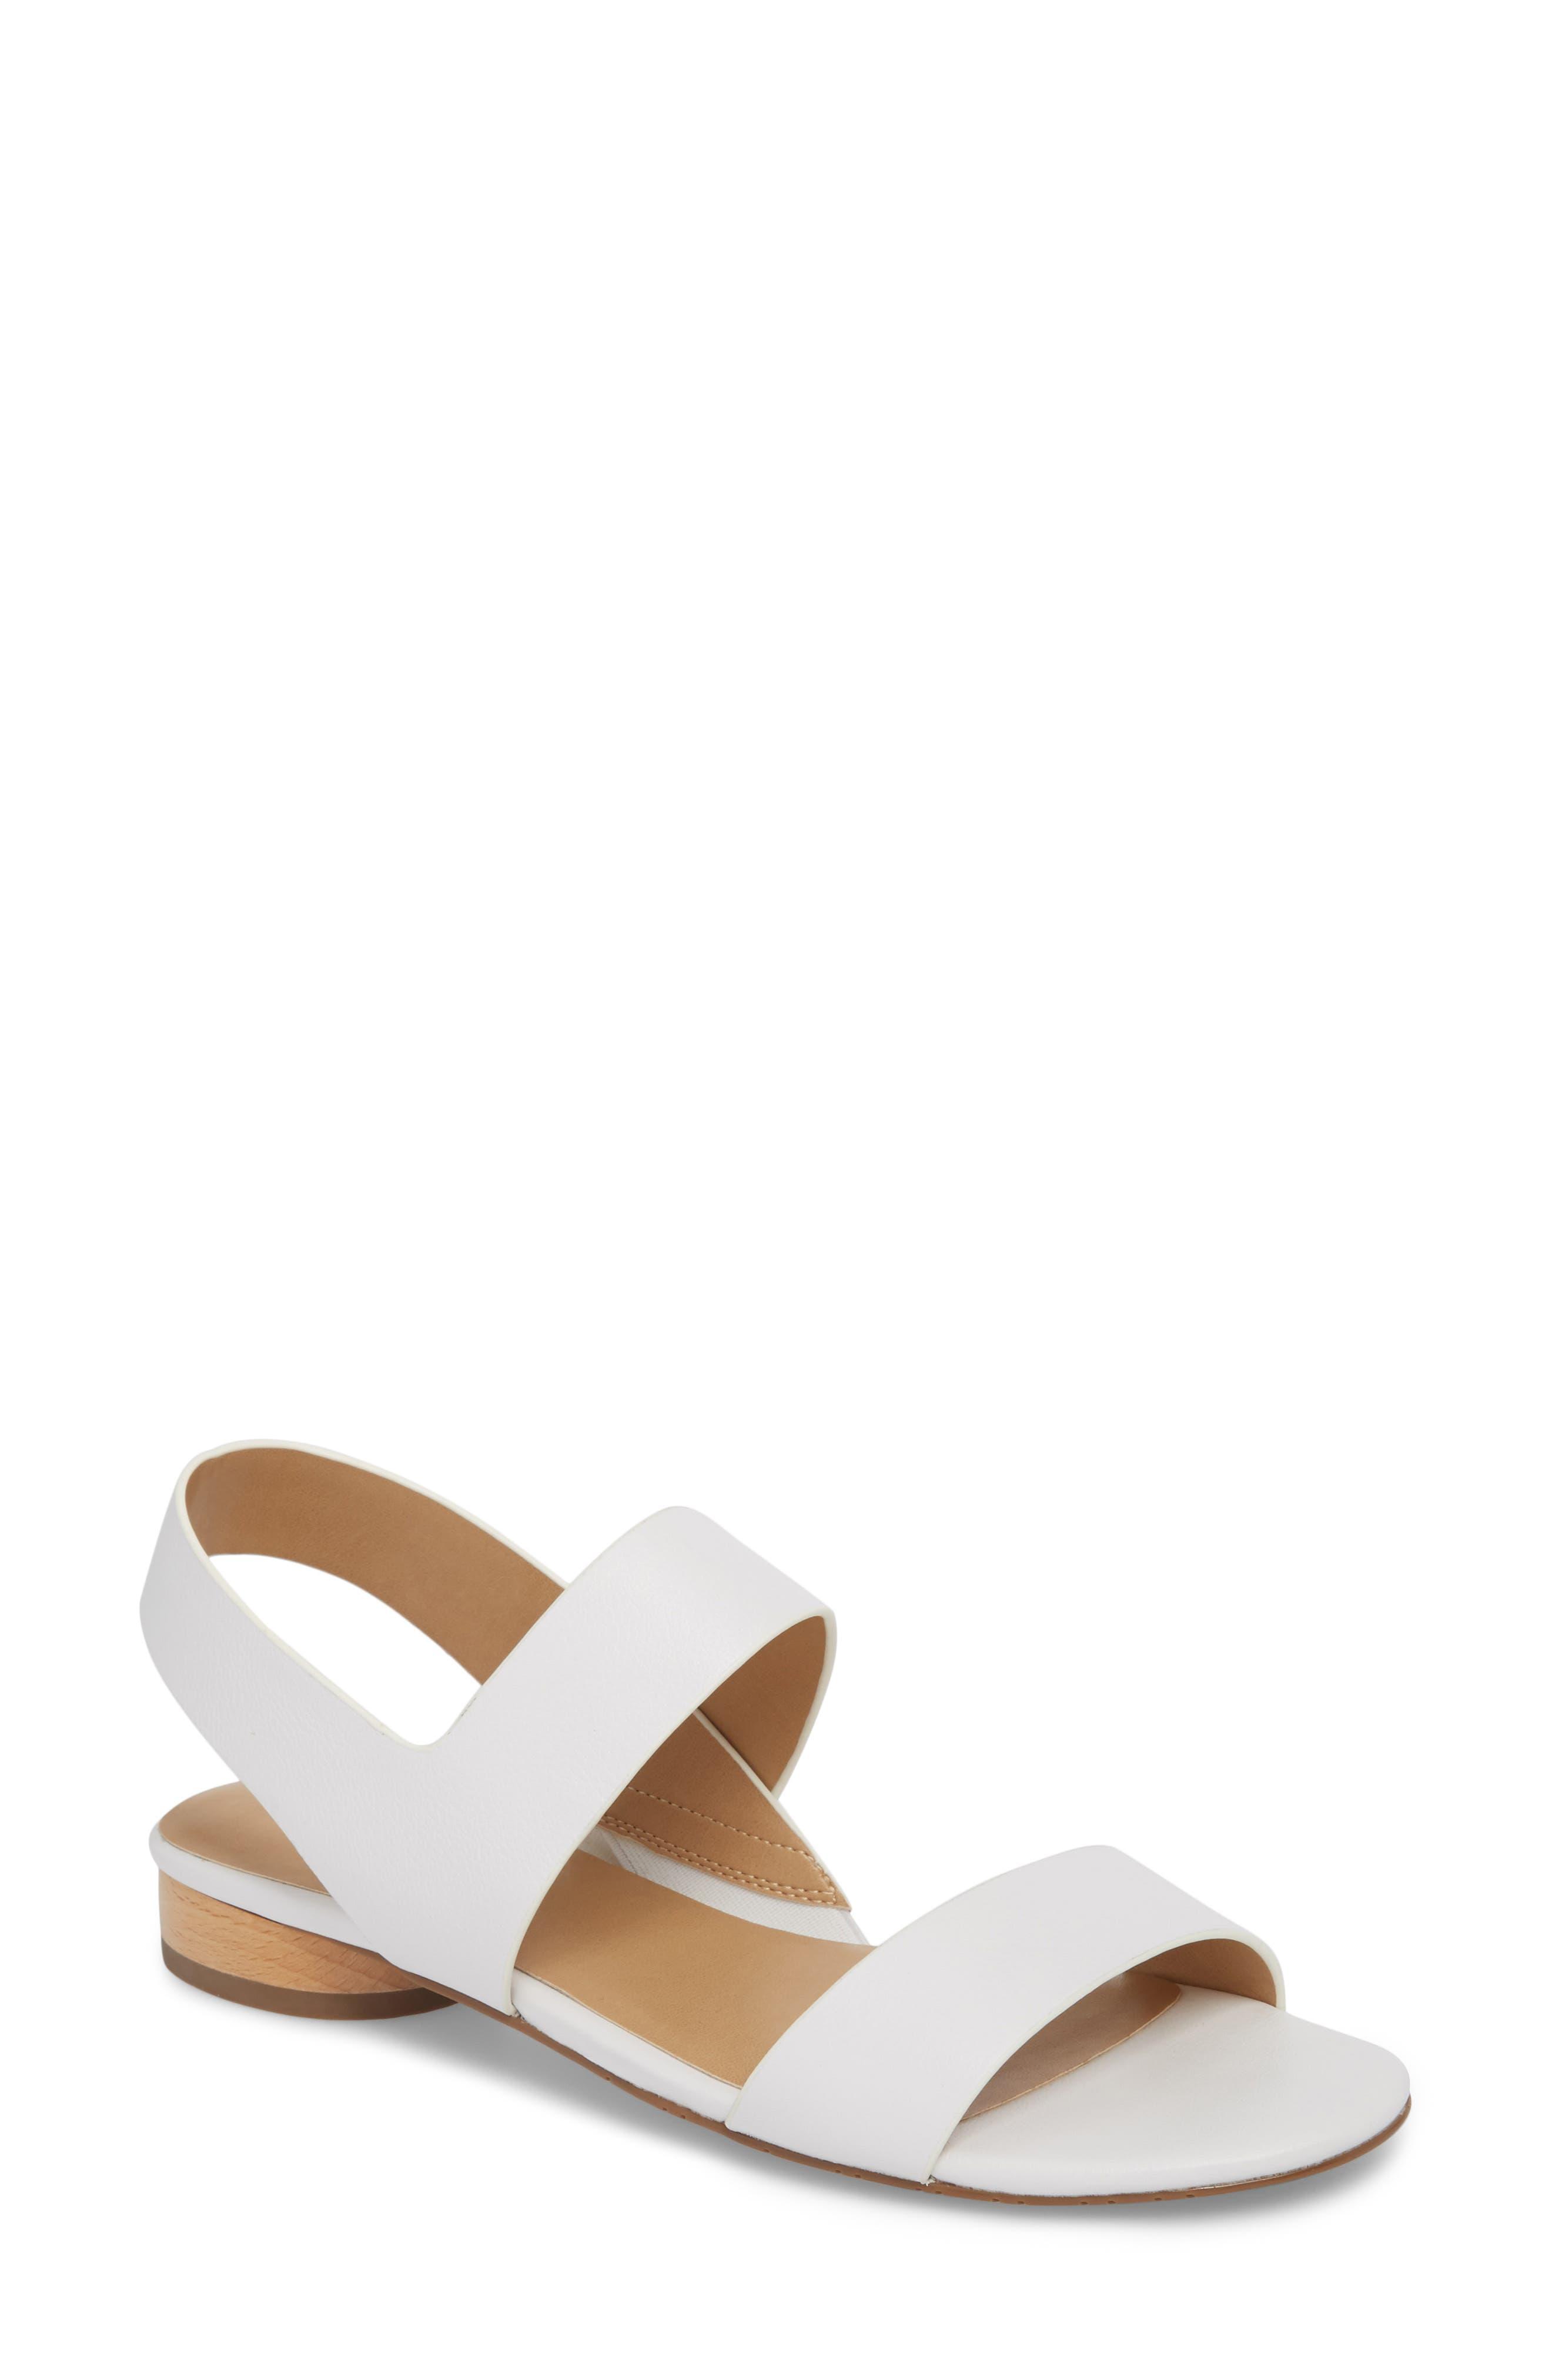 Blanka Sandal,                             Main thumbnail 1, color,                             White Leather